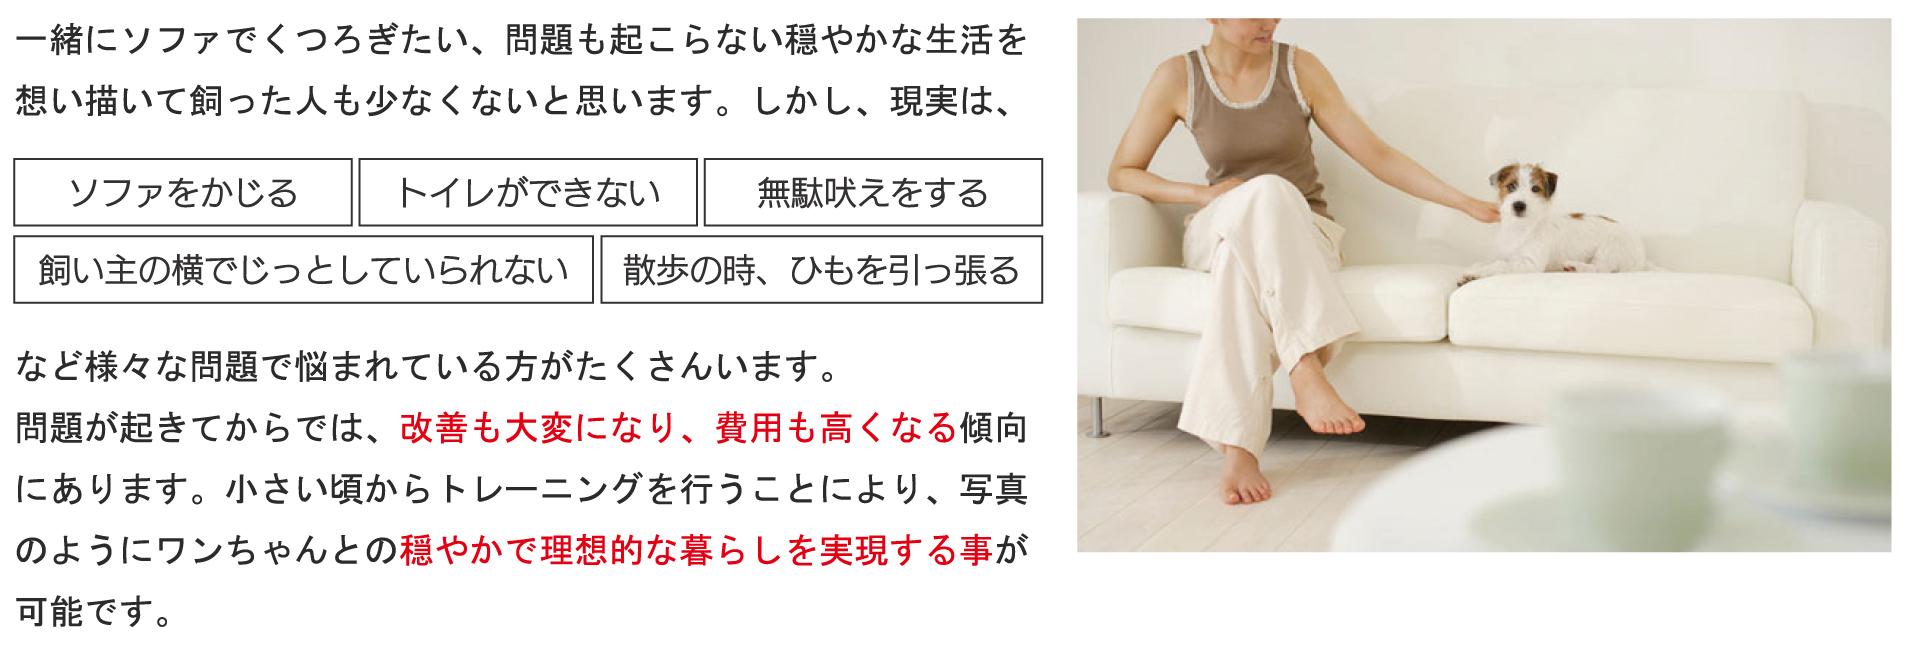 test001.jpg